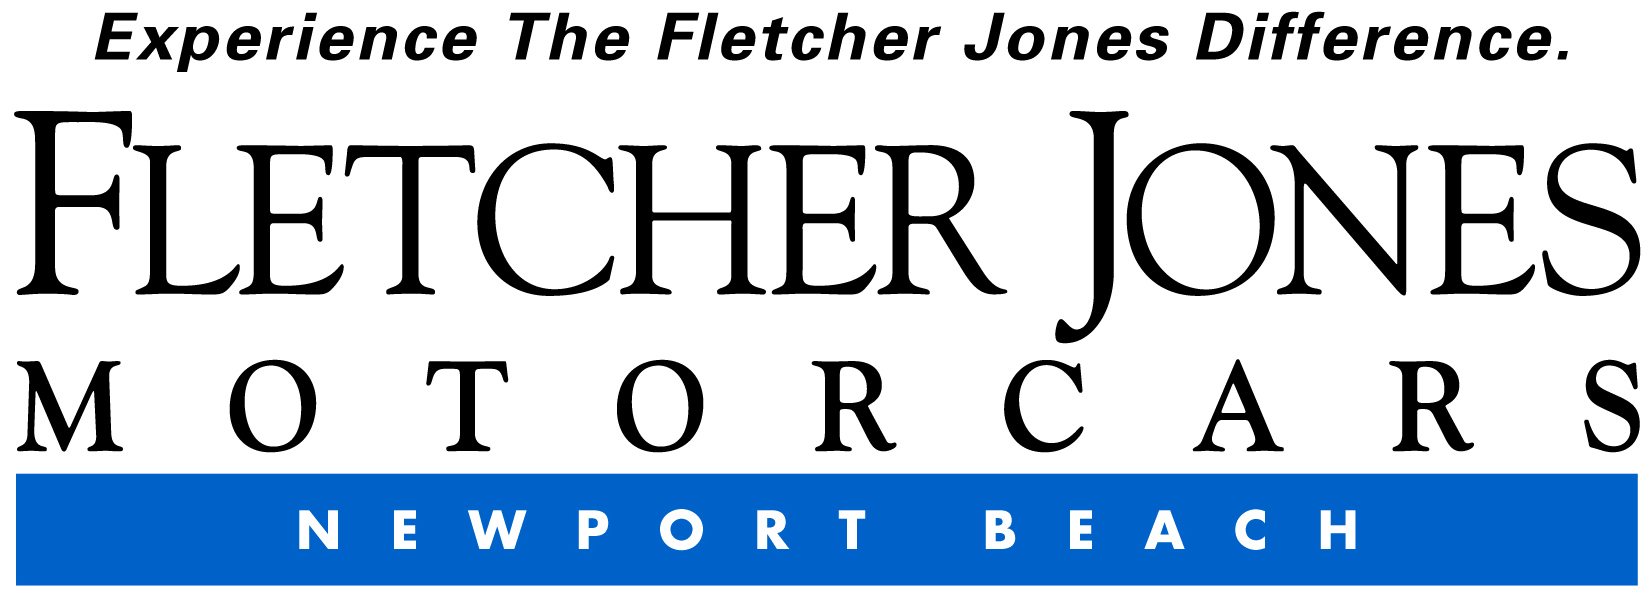 Fletcher Jones Motor Cars